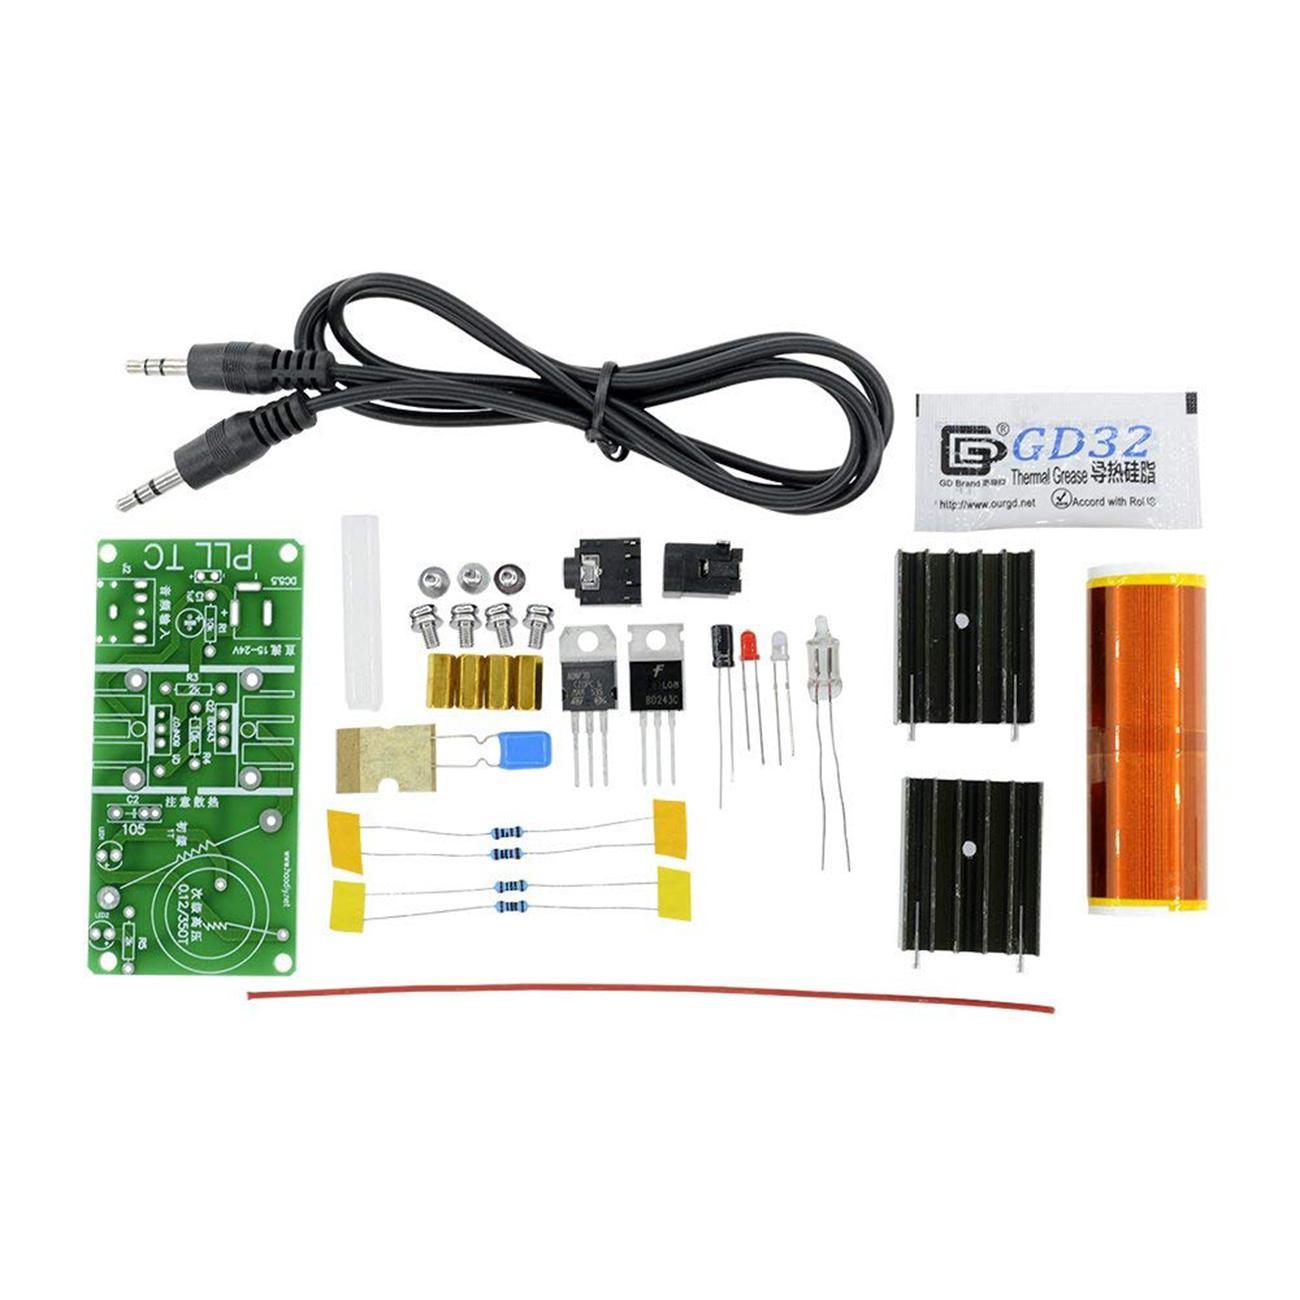 Dc 12v Mini Diy Tesla Coil Kit Arc Wireless Electric Power Wiring Diagram Product Display